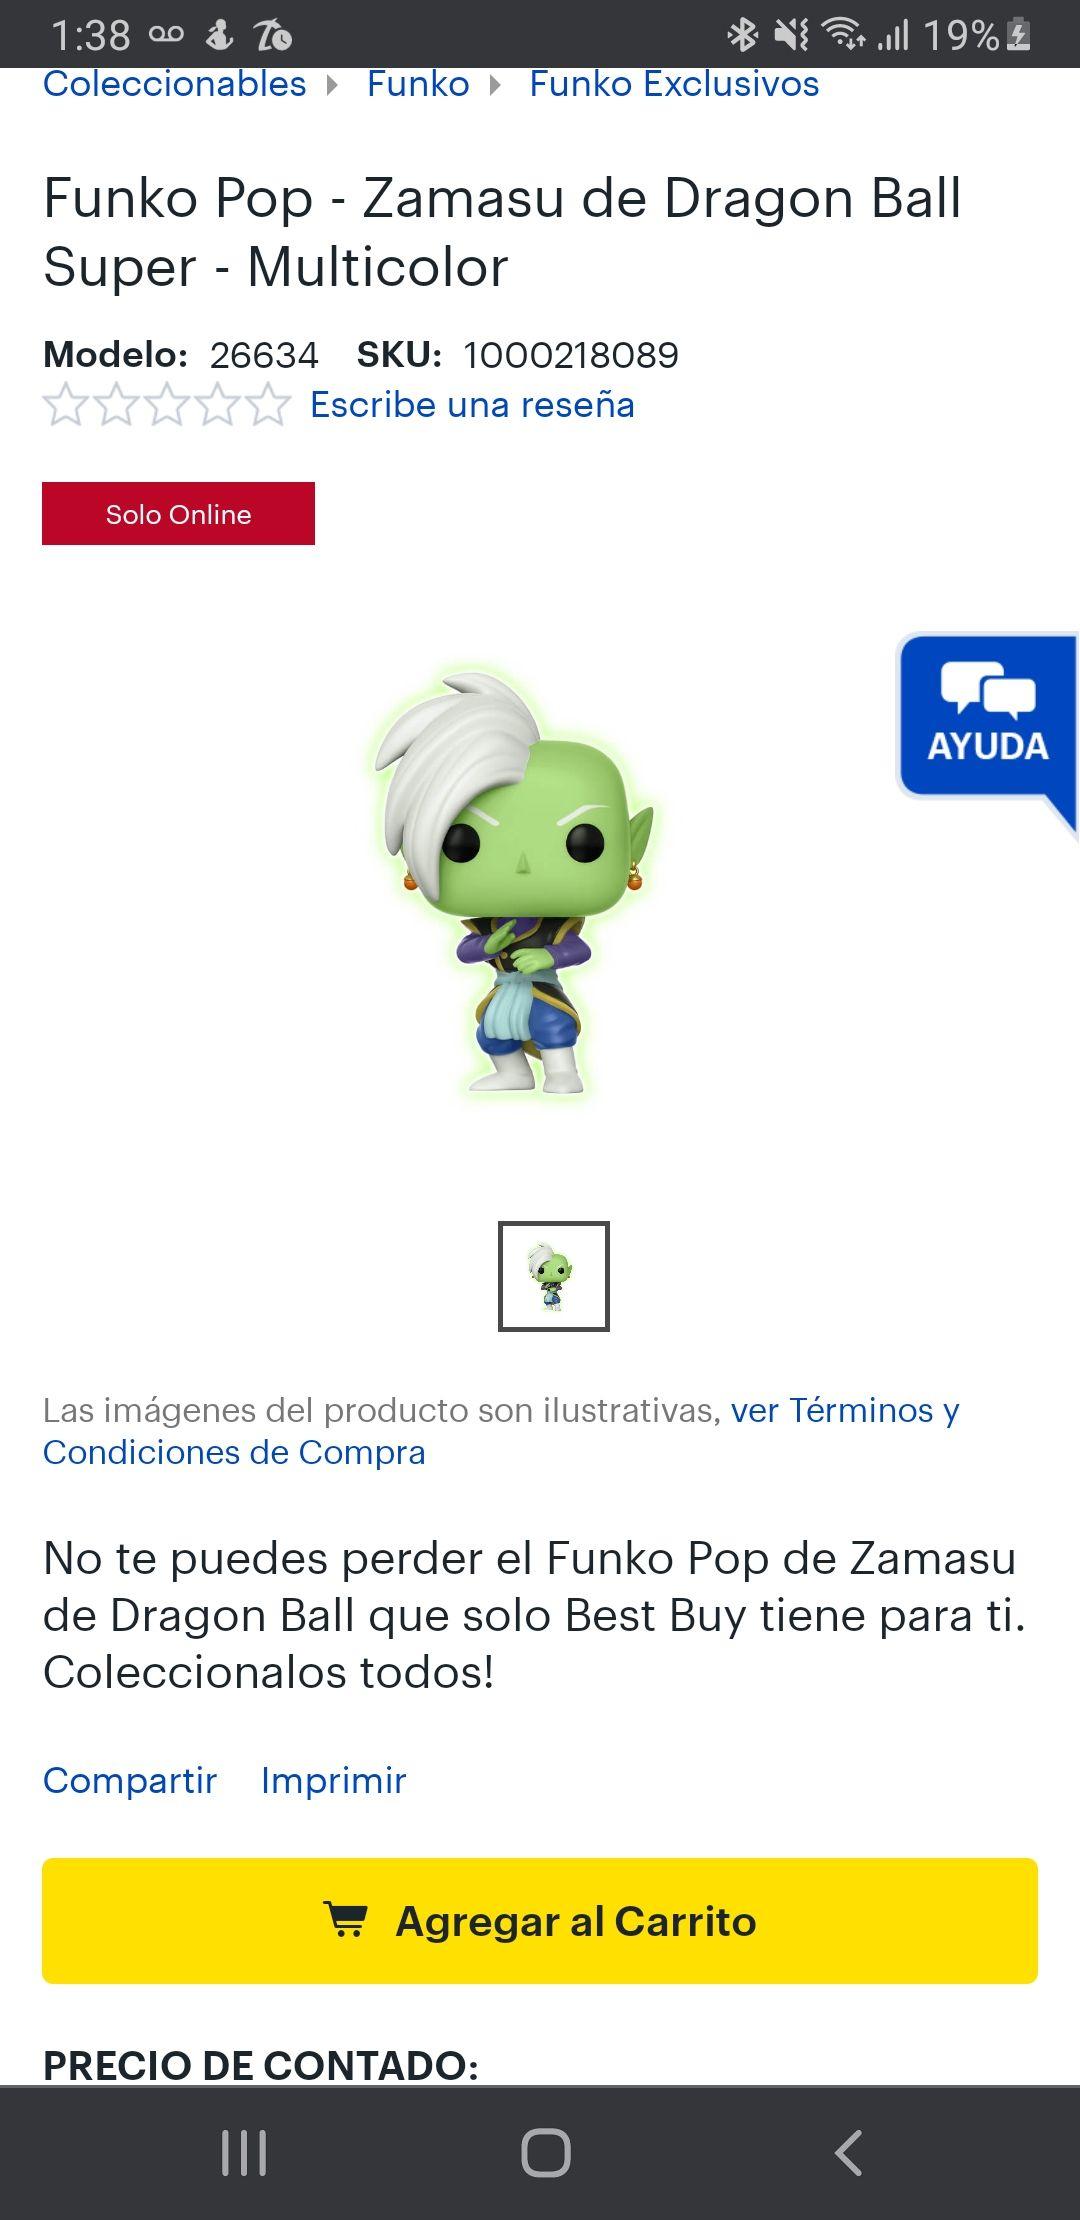 Best Buy: Funko Zamasu (Glow in the dark)